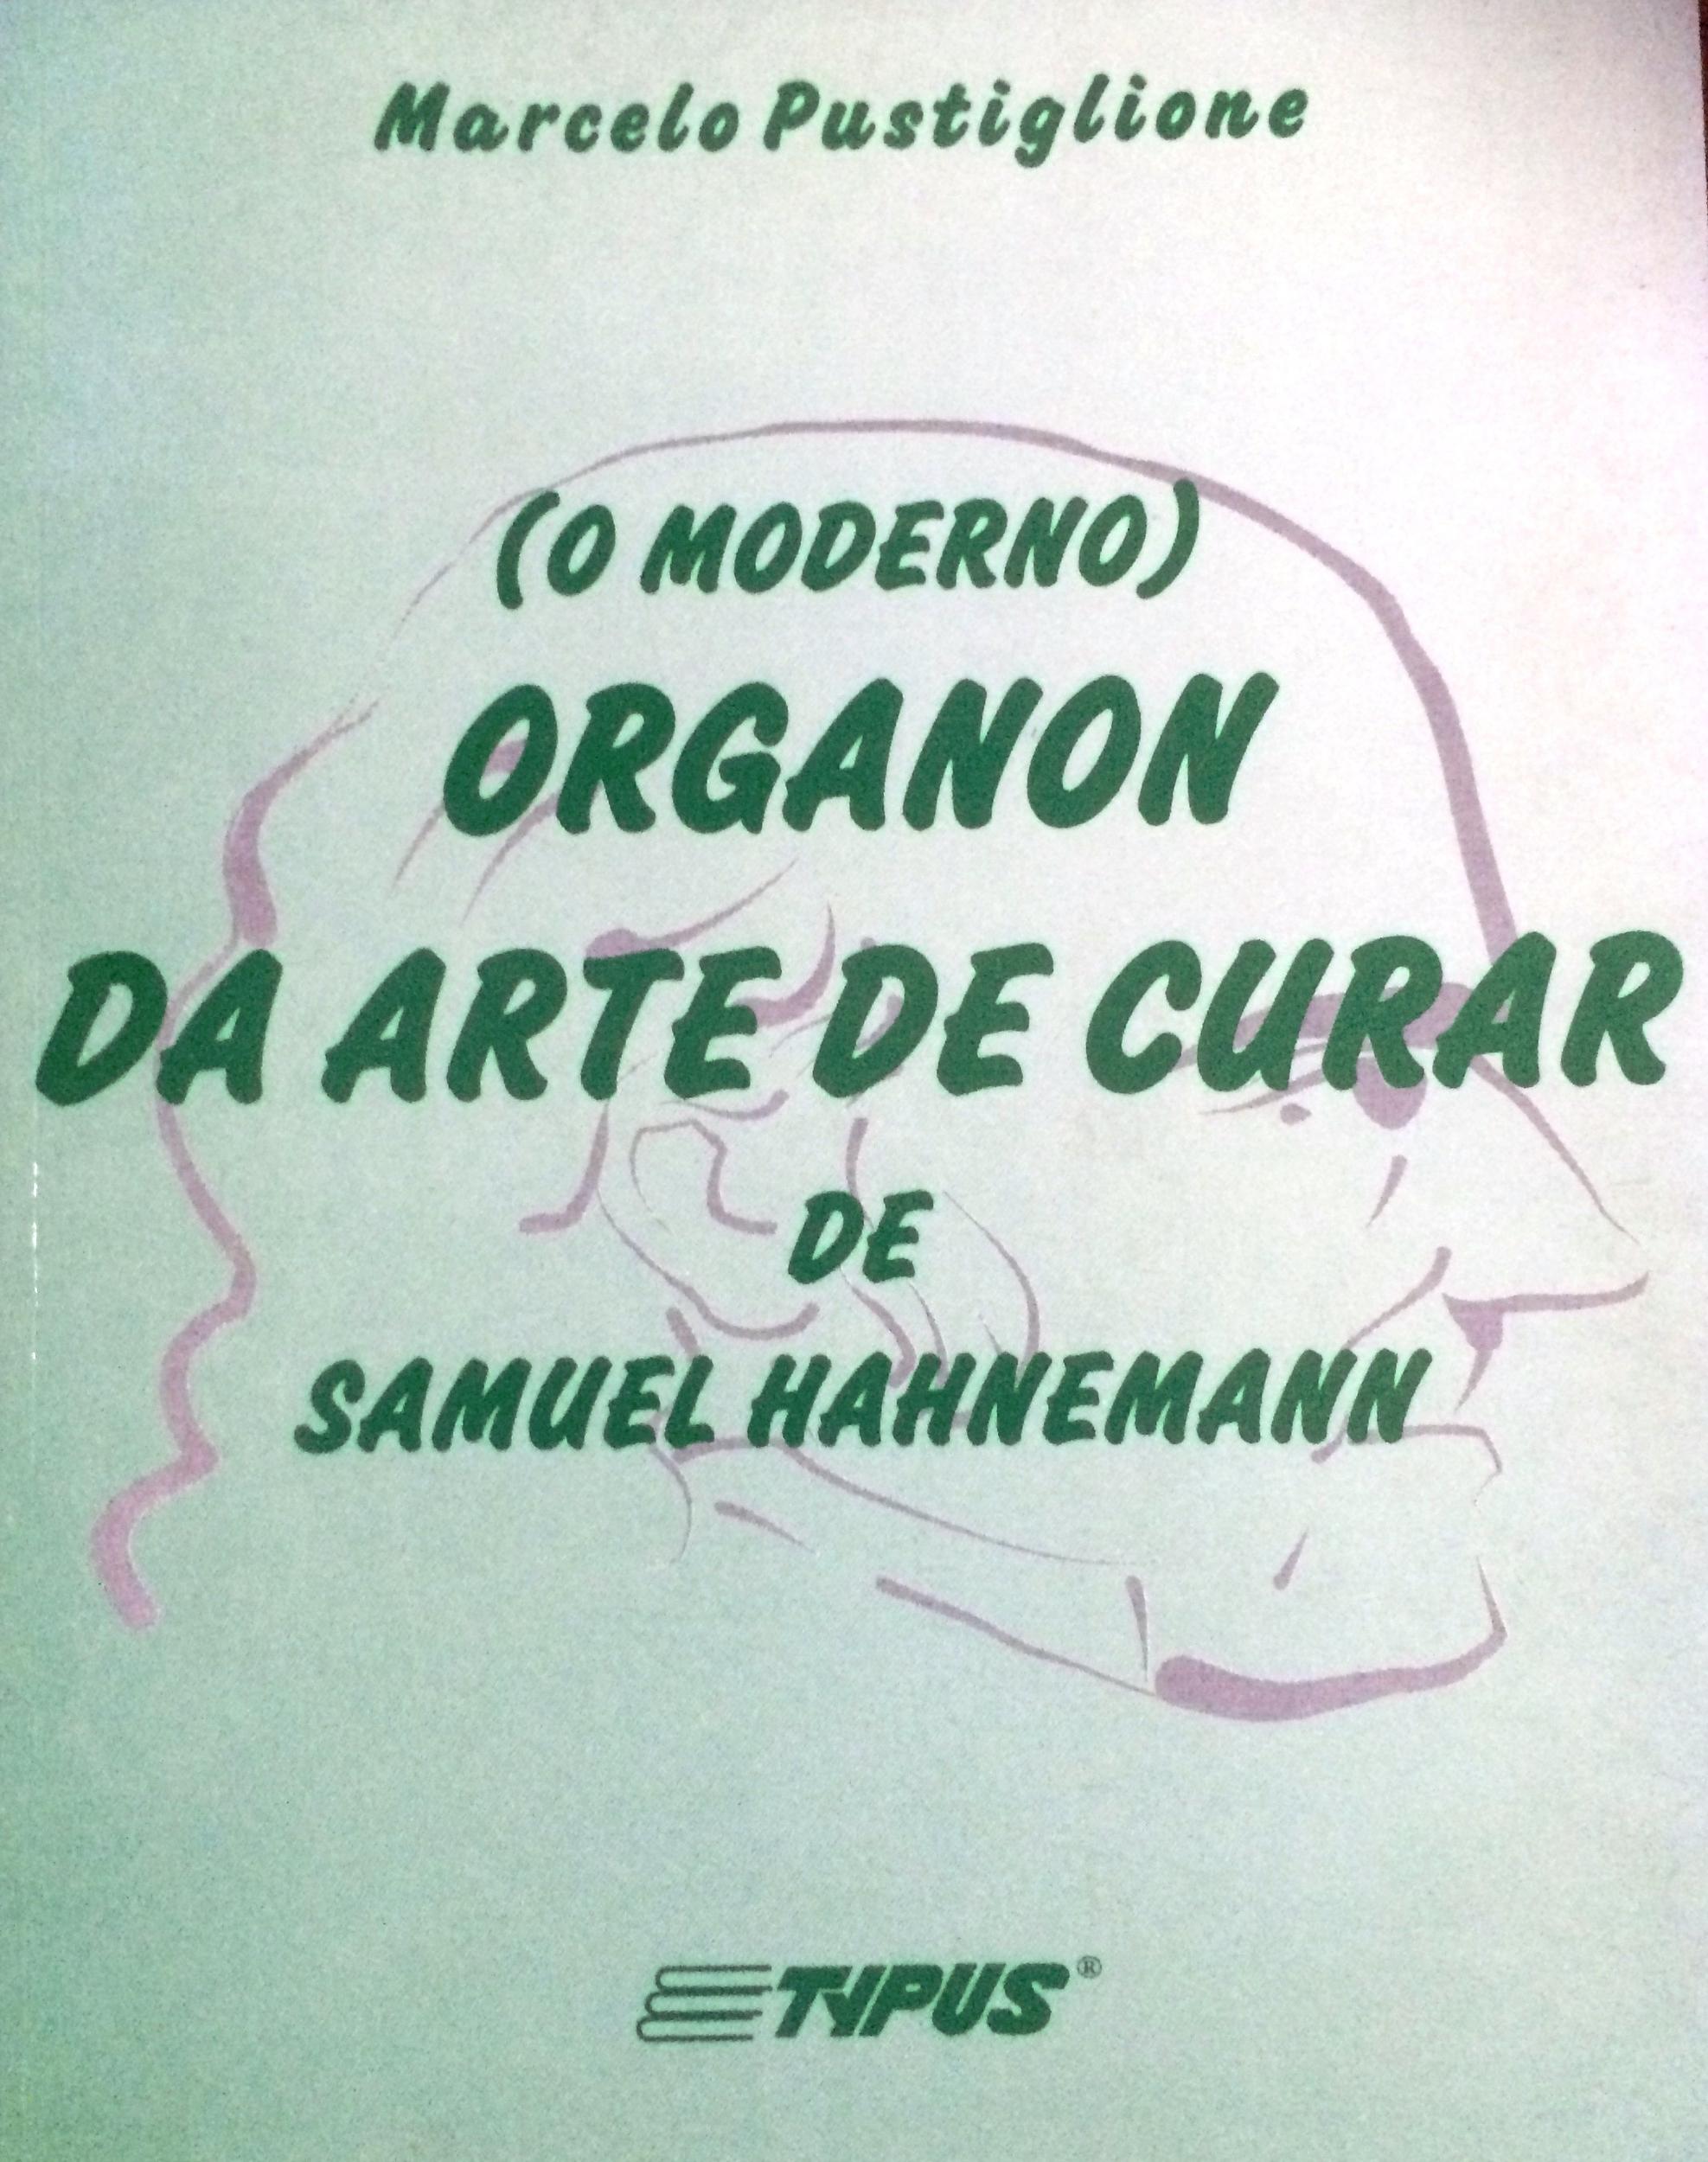 Moderno Organon 1 ed.jpg